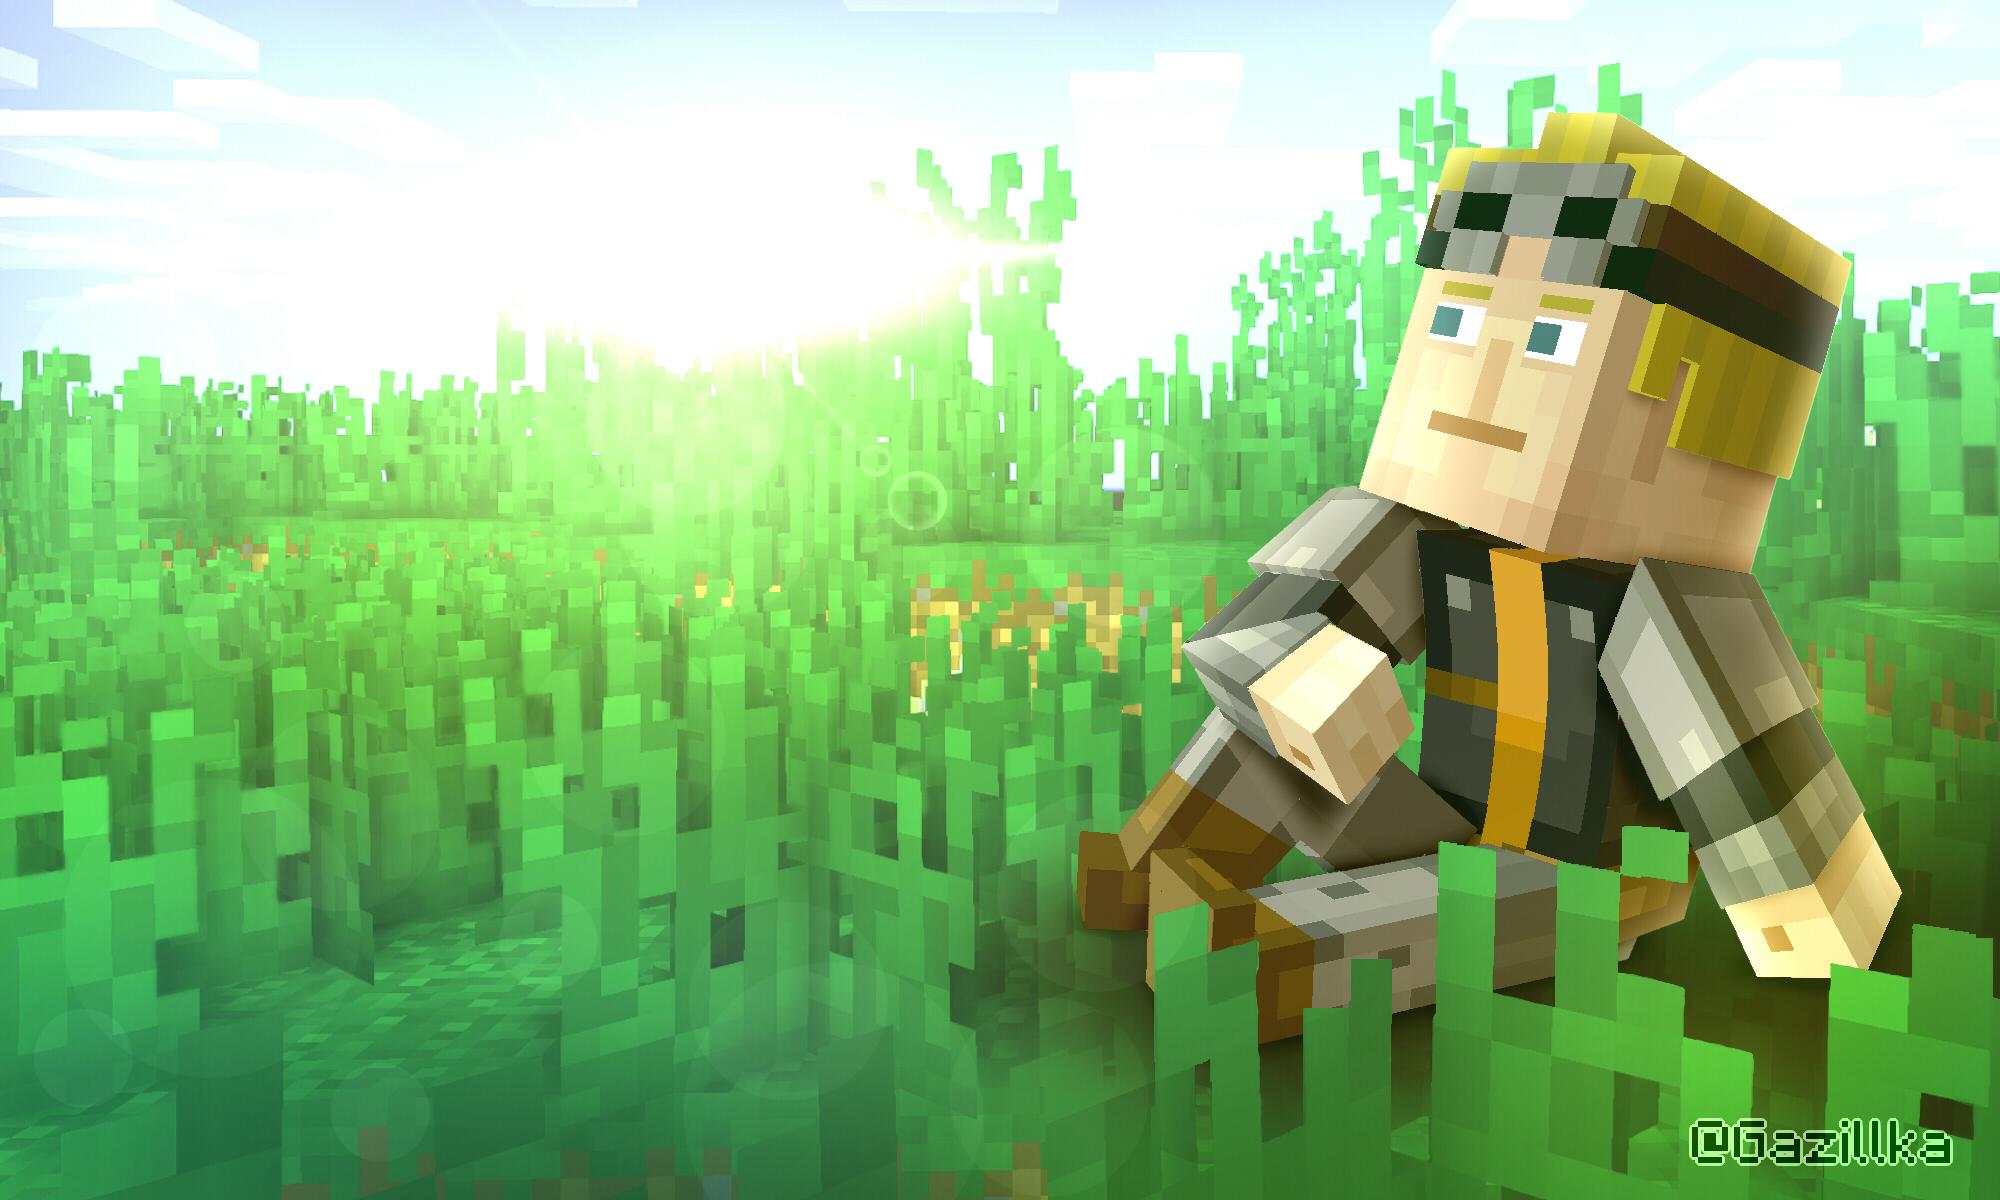 Minecraft Story Mode 2 Lukas Chilling By Gazillka On Deviantart